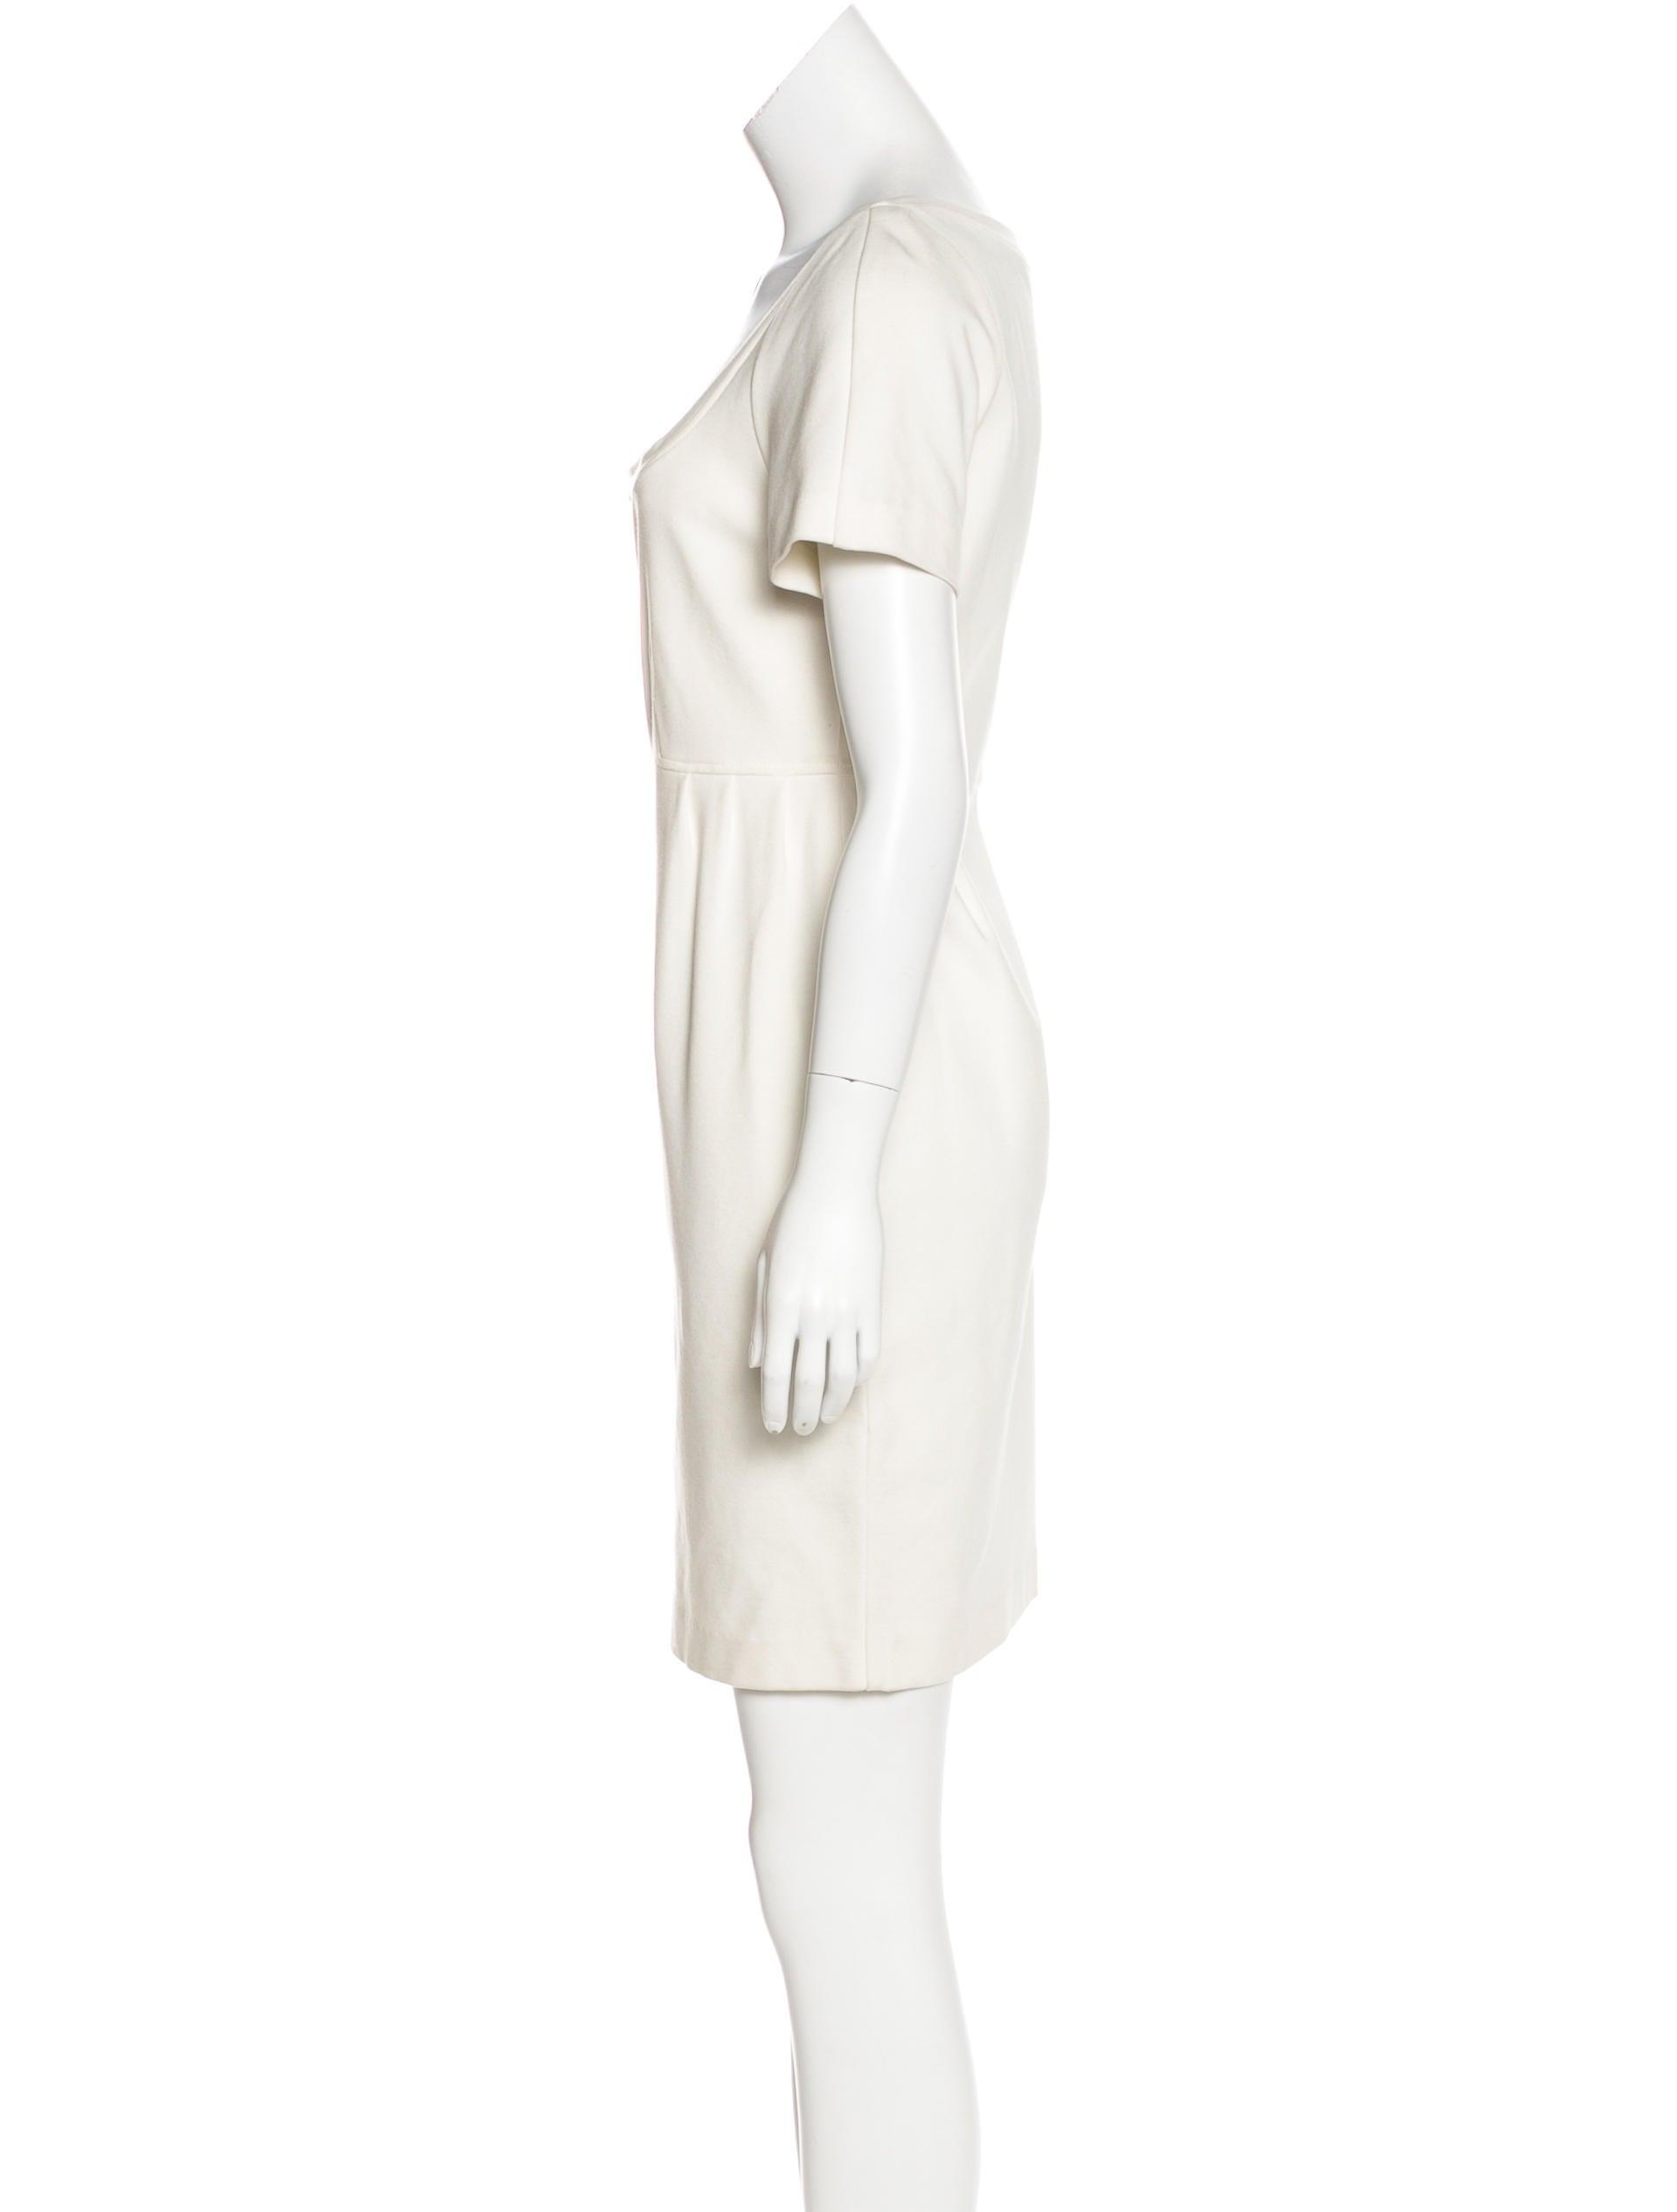 diane von furstenberg mini casual dress clothing wdi116071 the Marchesa Evening Gowns mini casual dress